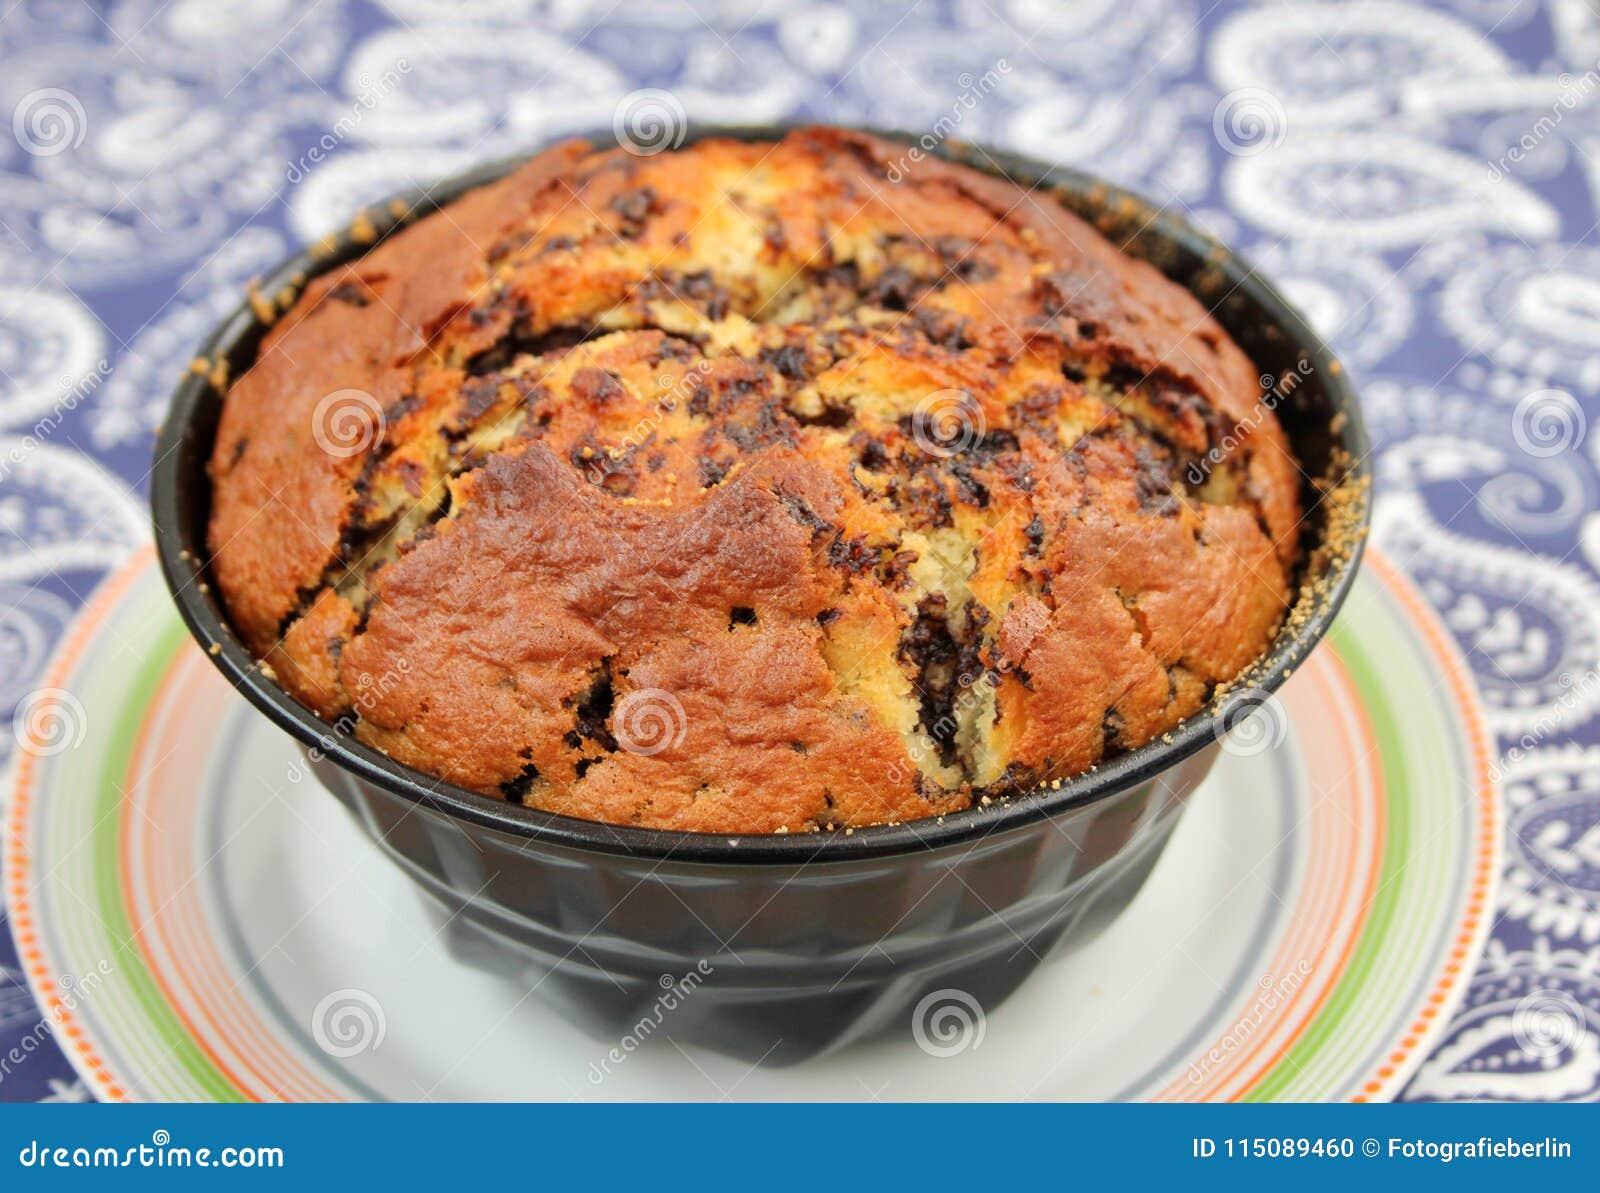 Homemade cake with chocolate